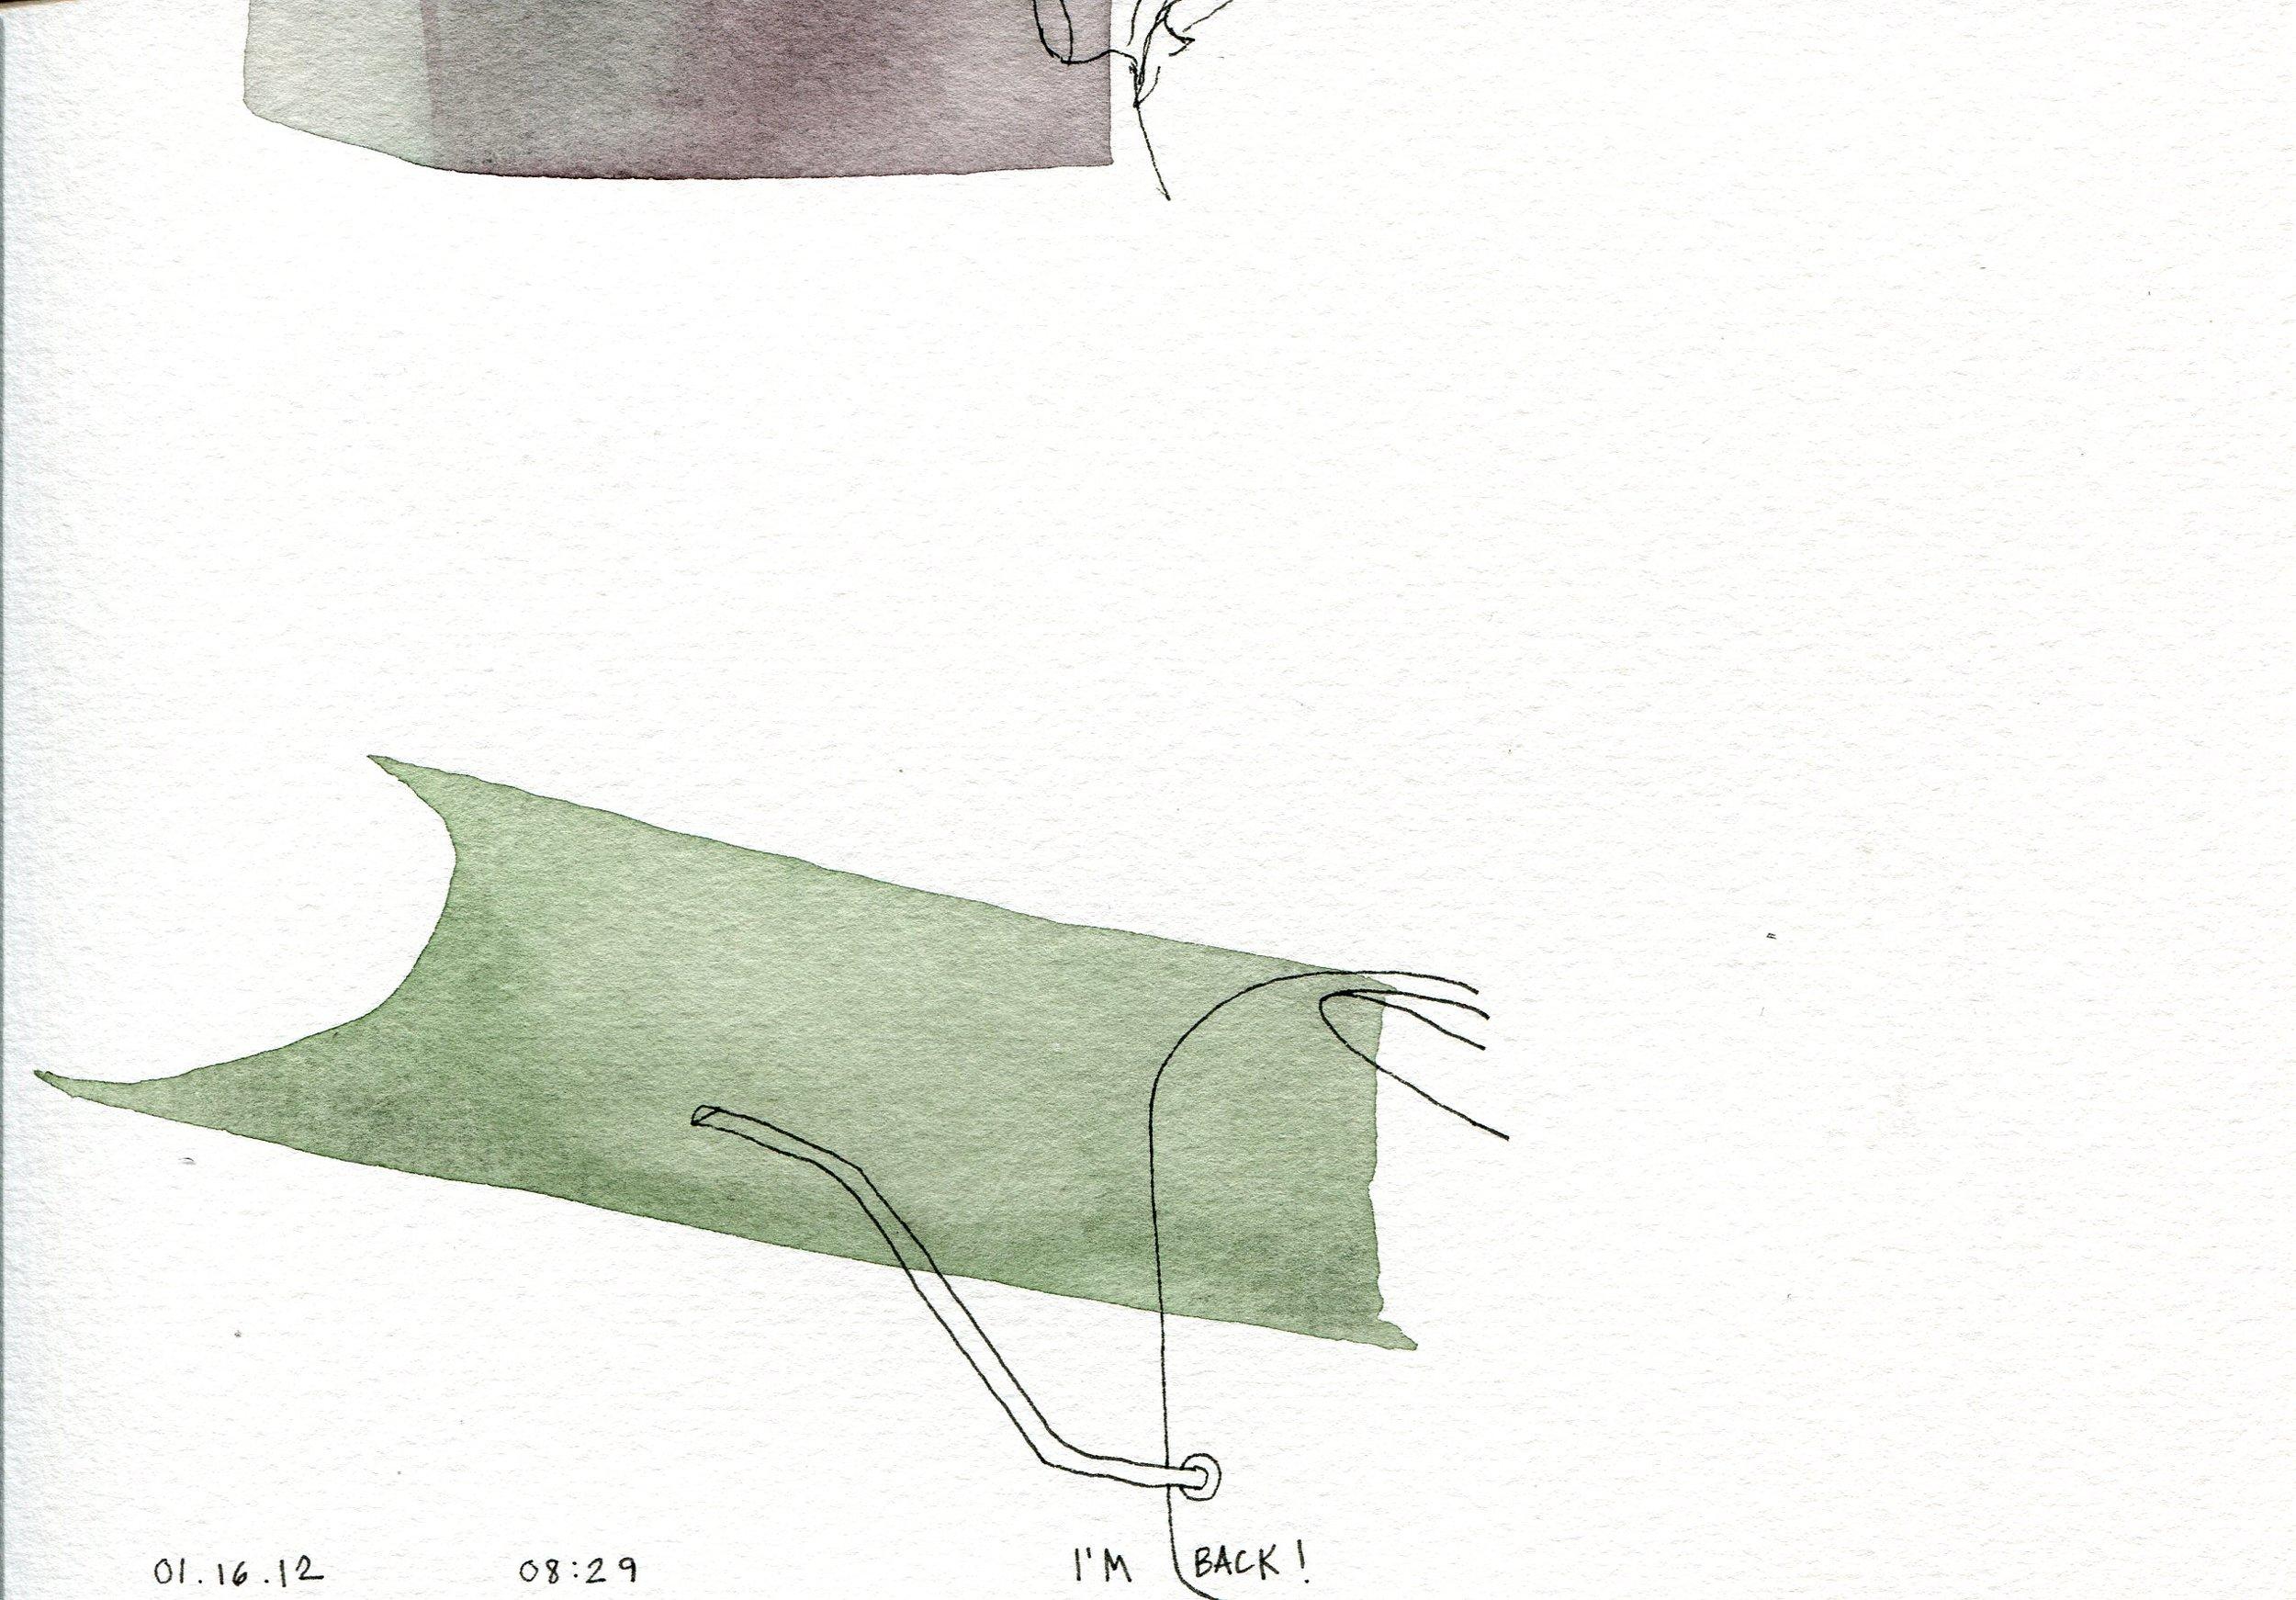 2012-01-20 drawing003.jpg